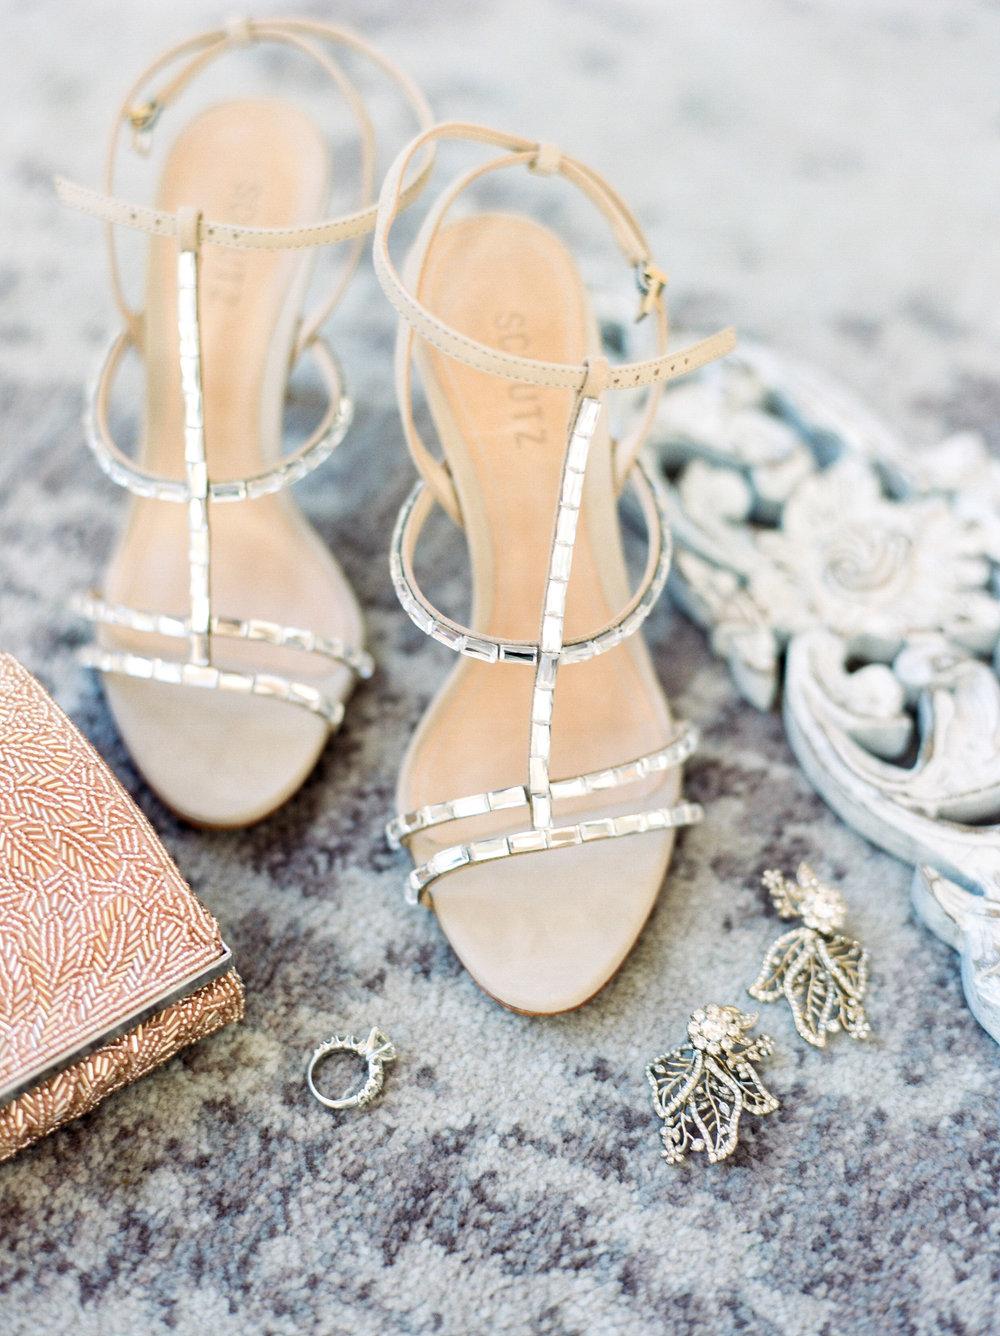 Houston-Wedding-Photographer-Lakeside-Country-Club-First-Look-Bride-Groom-Formals-Film-Fine-Art-Photography-5.jpg